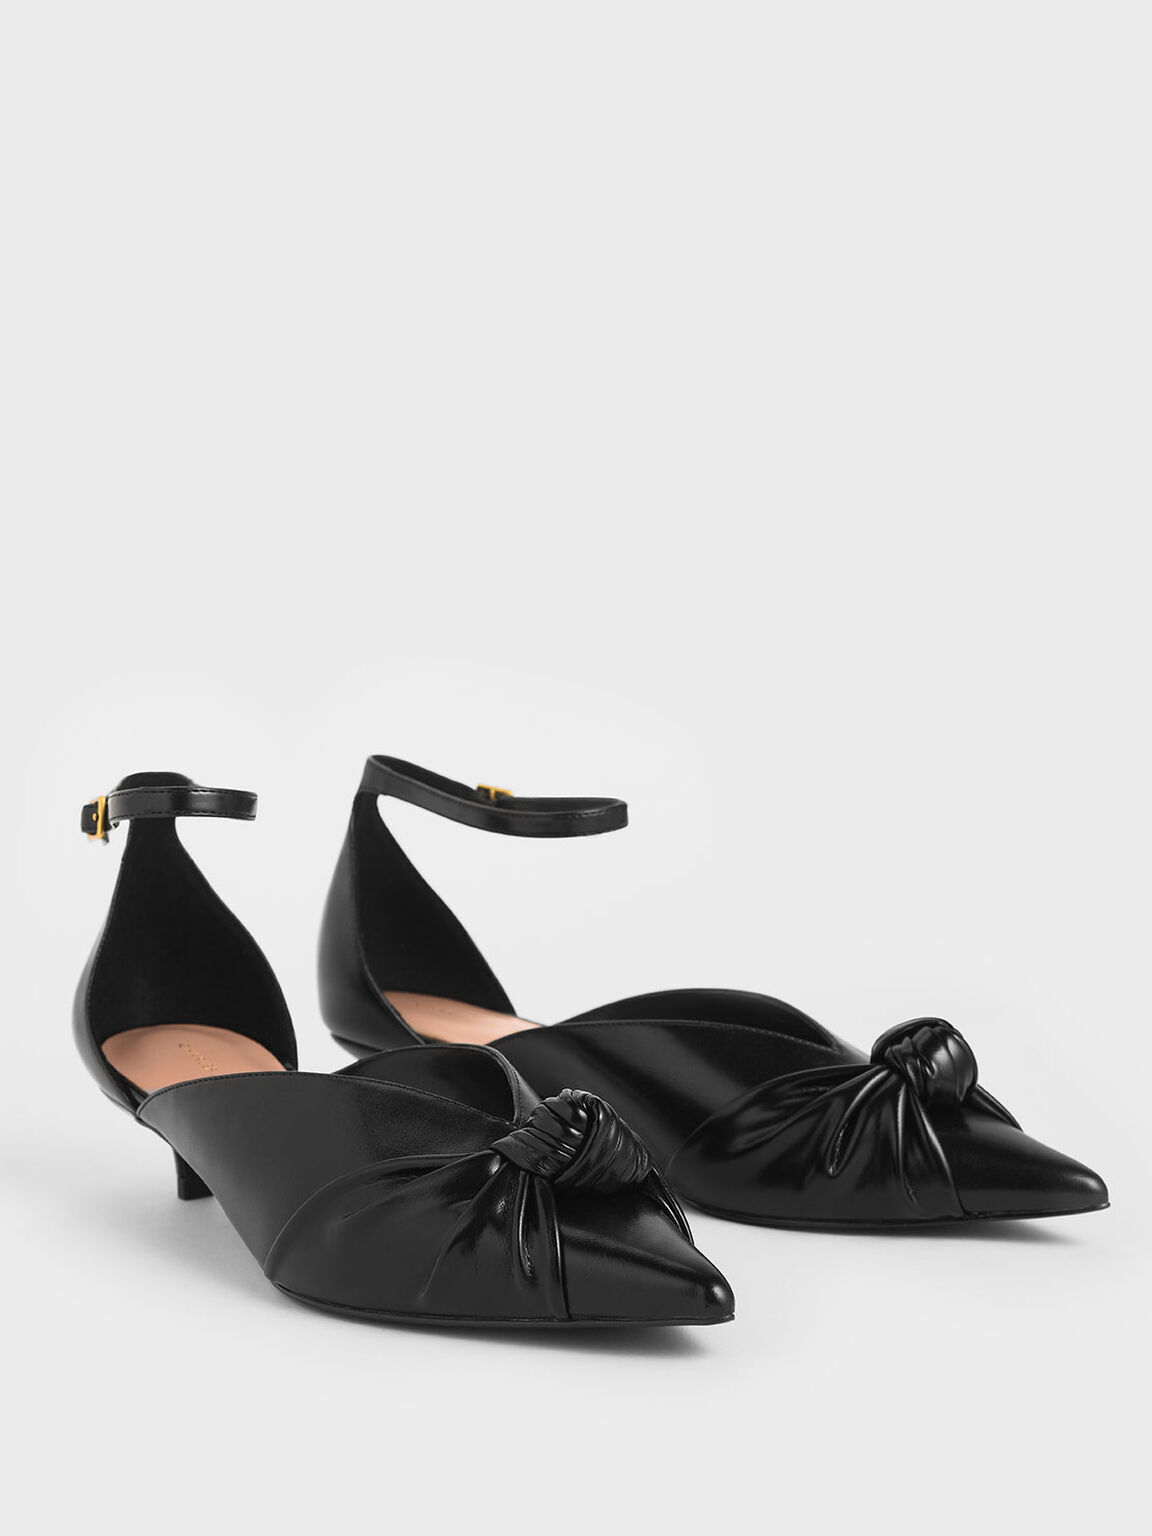 扭結低跟鞋, 黑色, hi-res